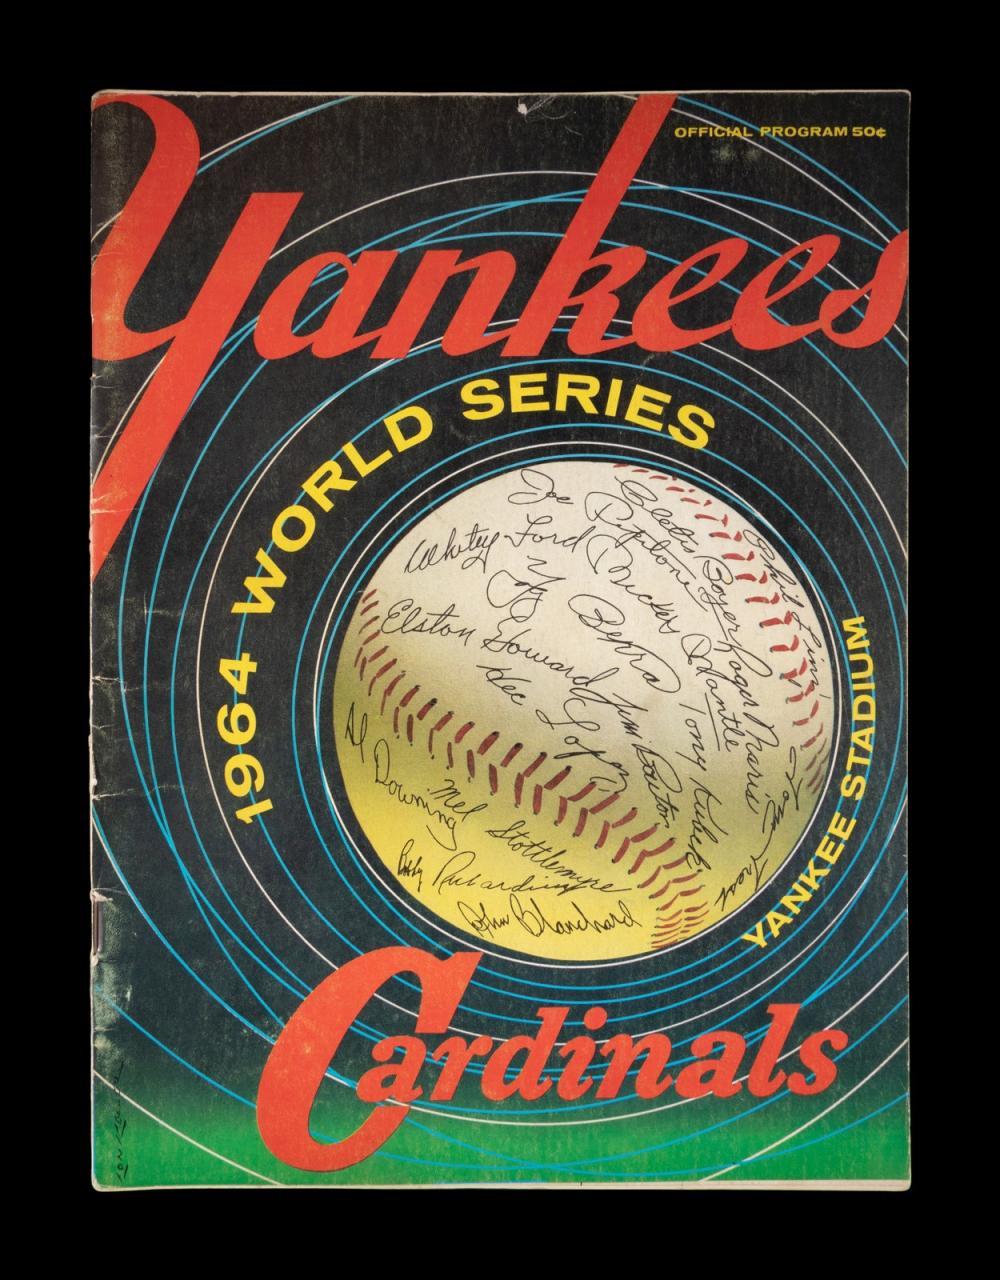 A Group of Three New York Yankees Mickey Mantle Yankee Stadium Items,